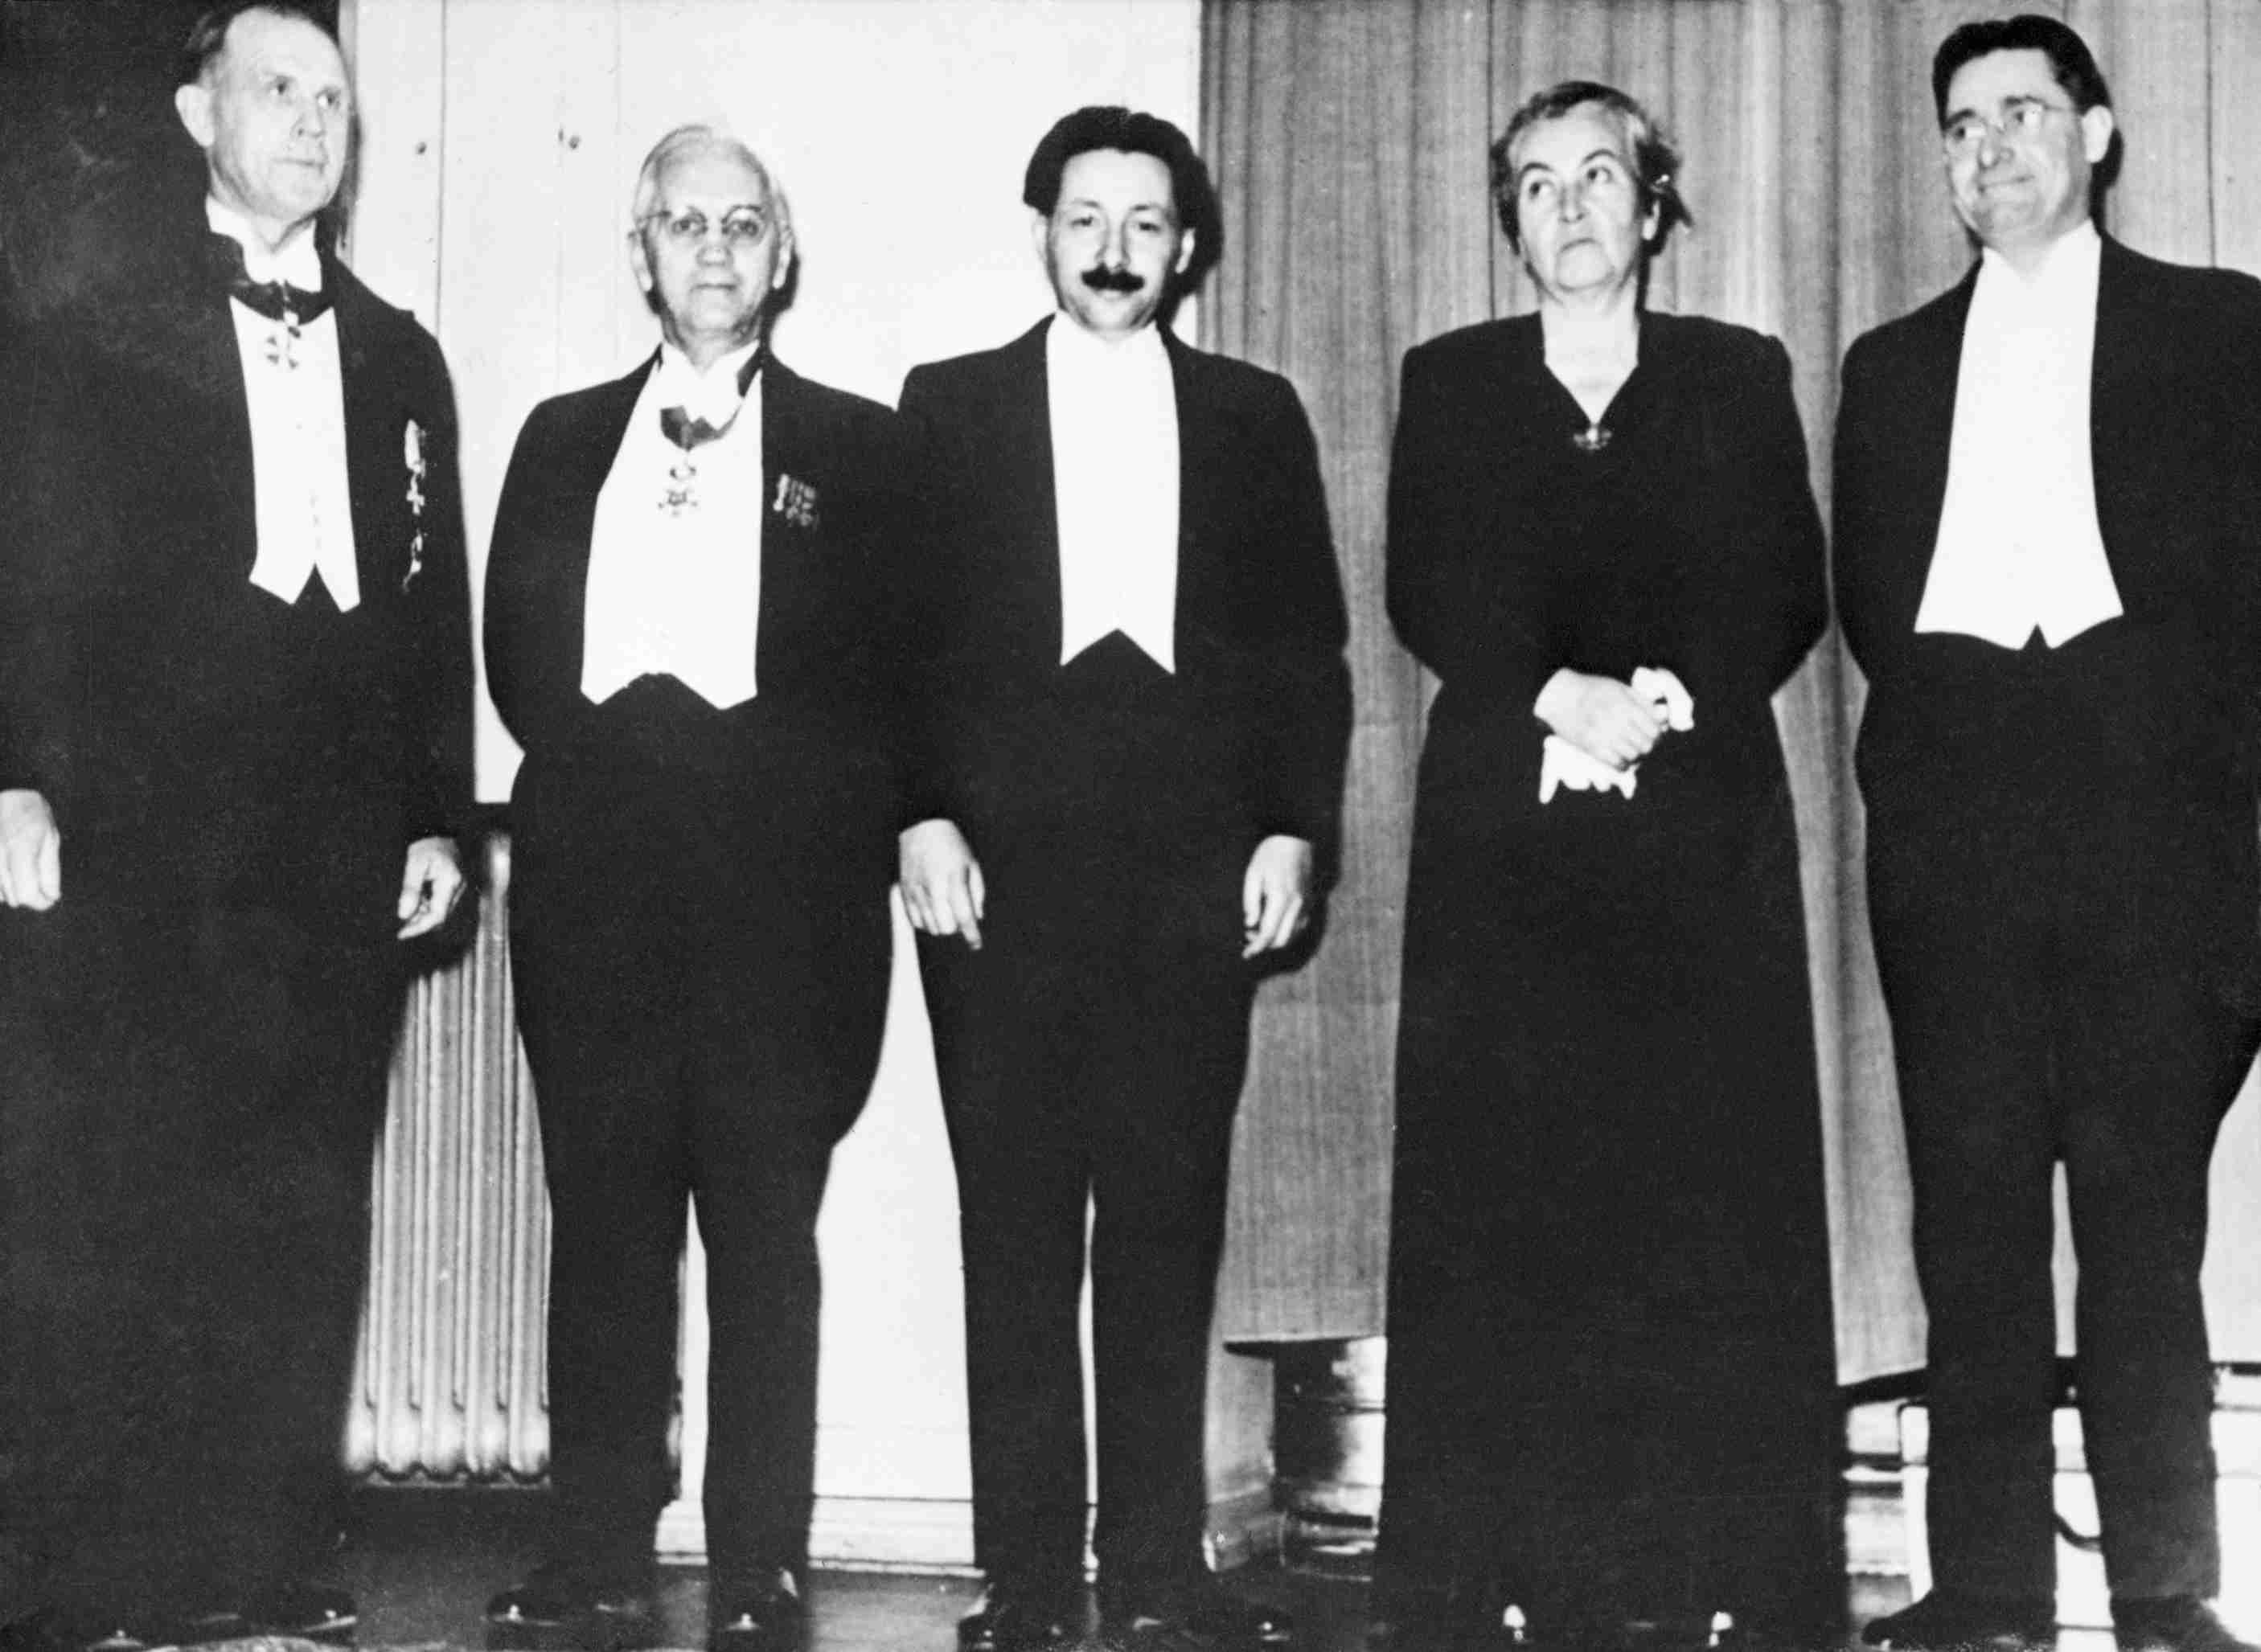 Nobel Prize Winners of 1945